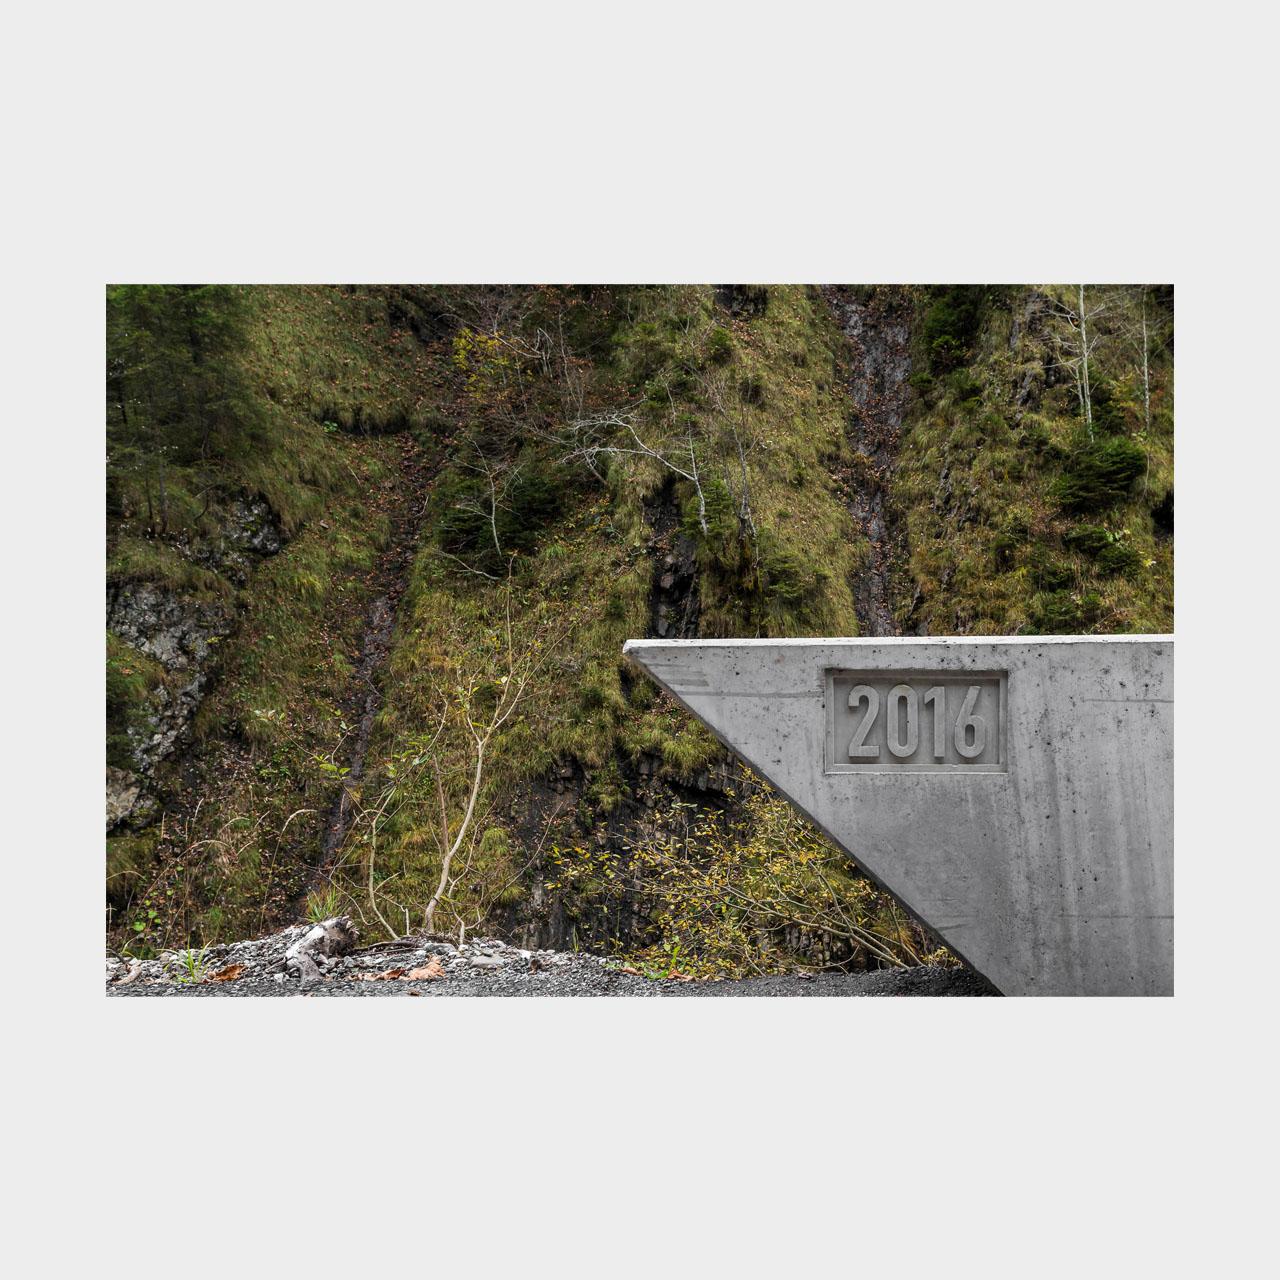 Architekturfotografie Schanerlochbrücke Ebnit